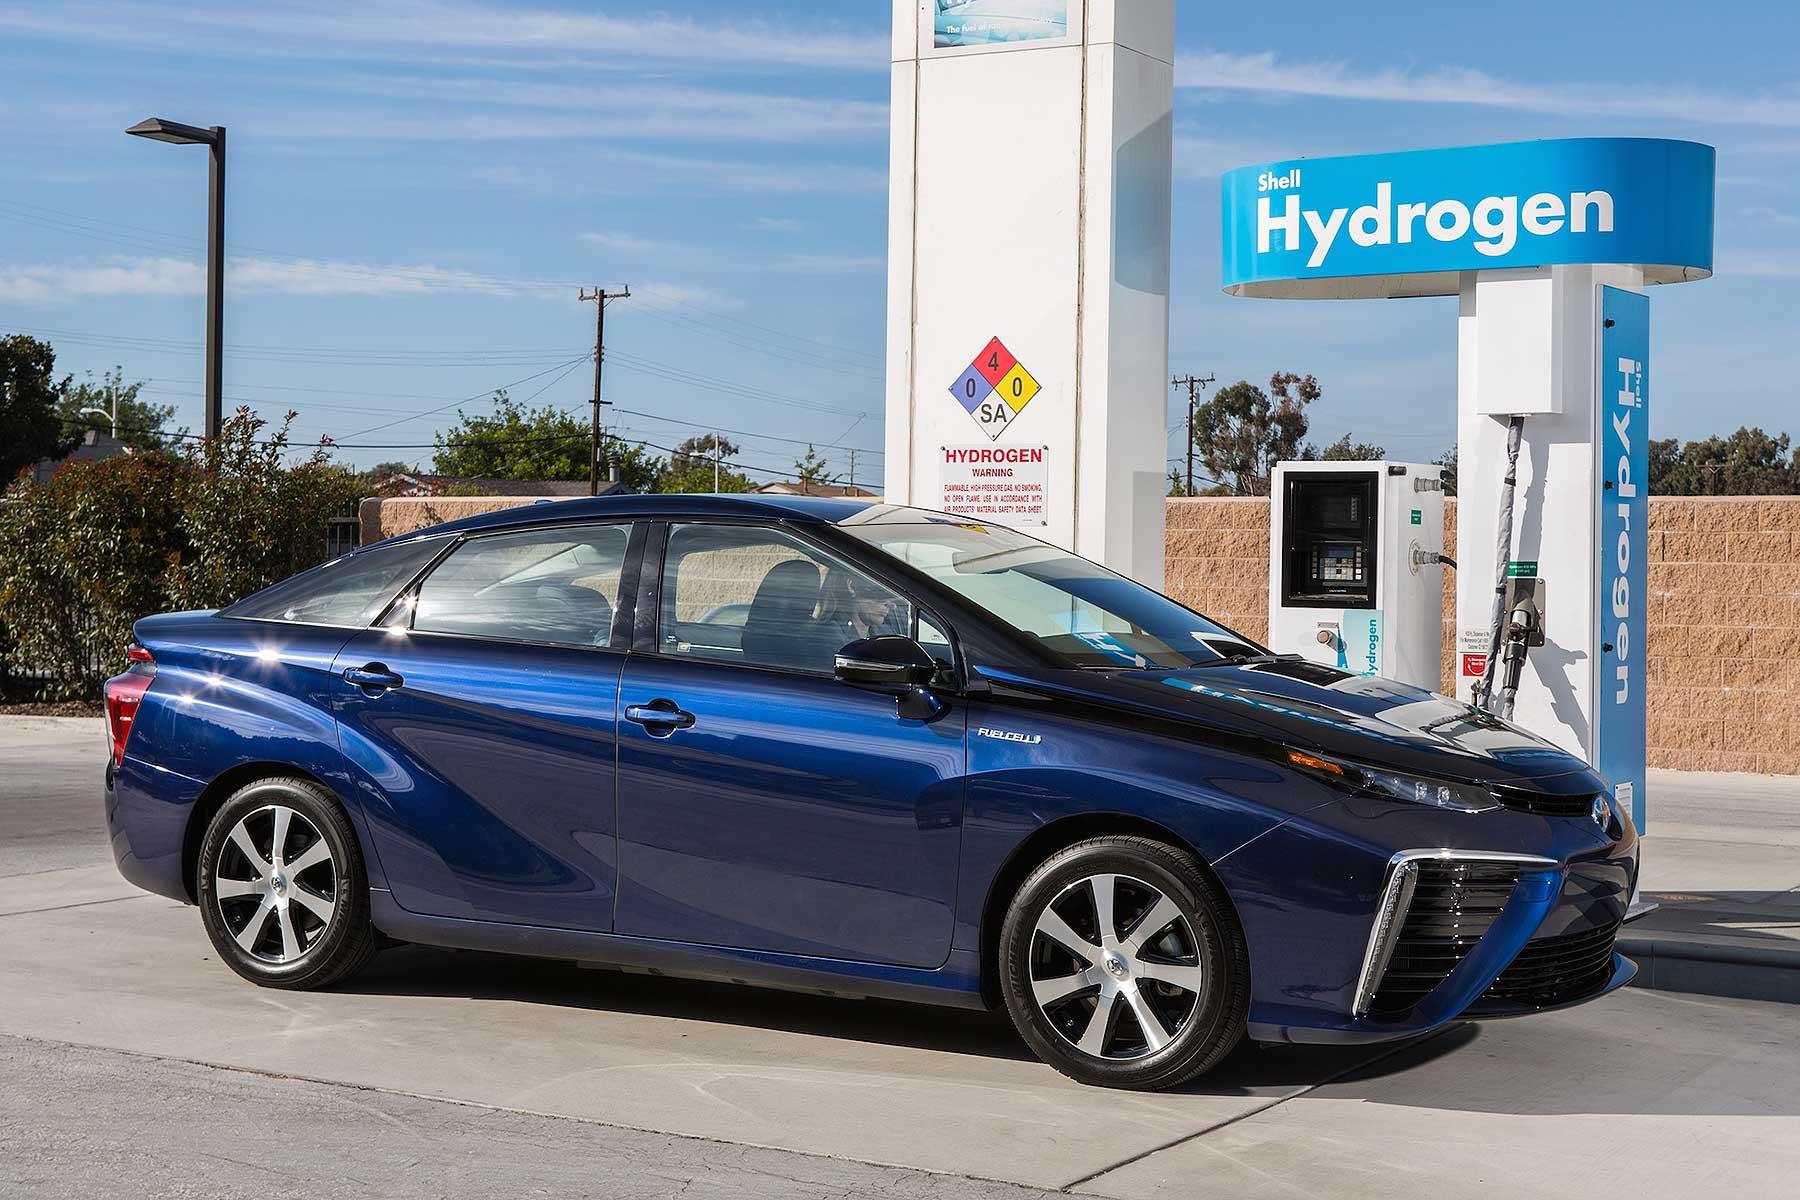 Toyota Mirai Hydrogen Fuel Cell